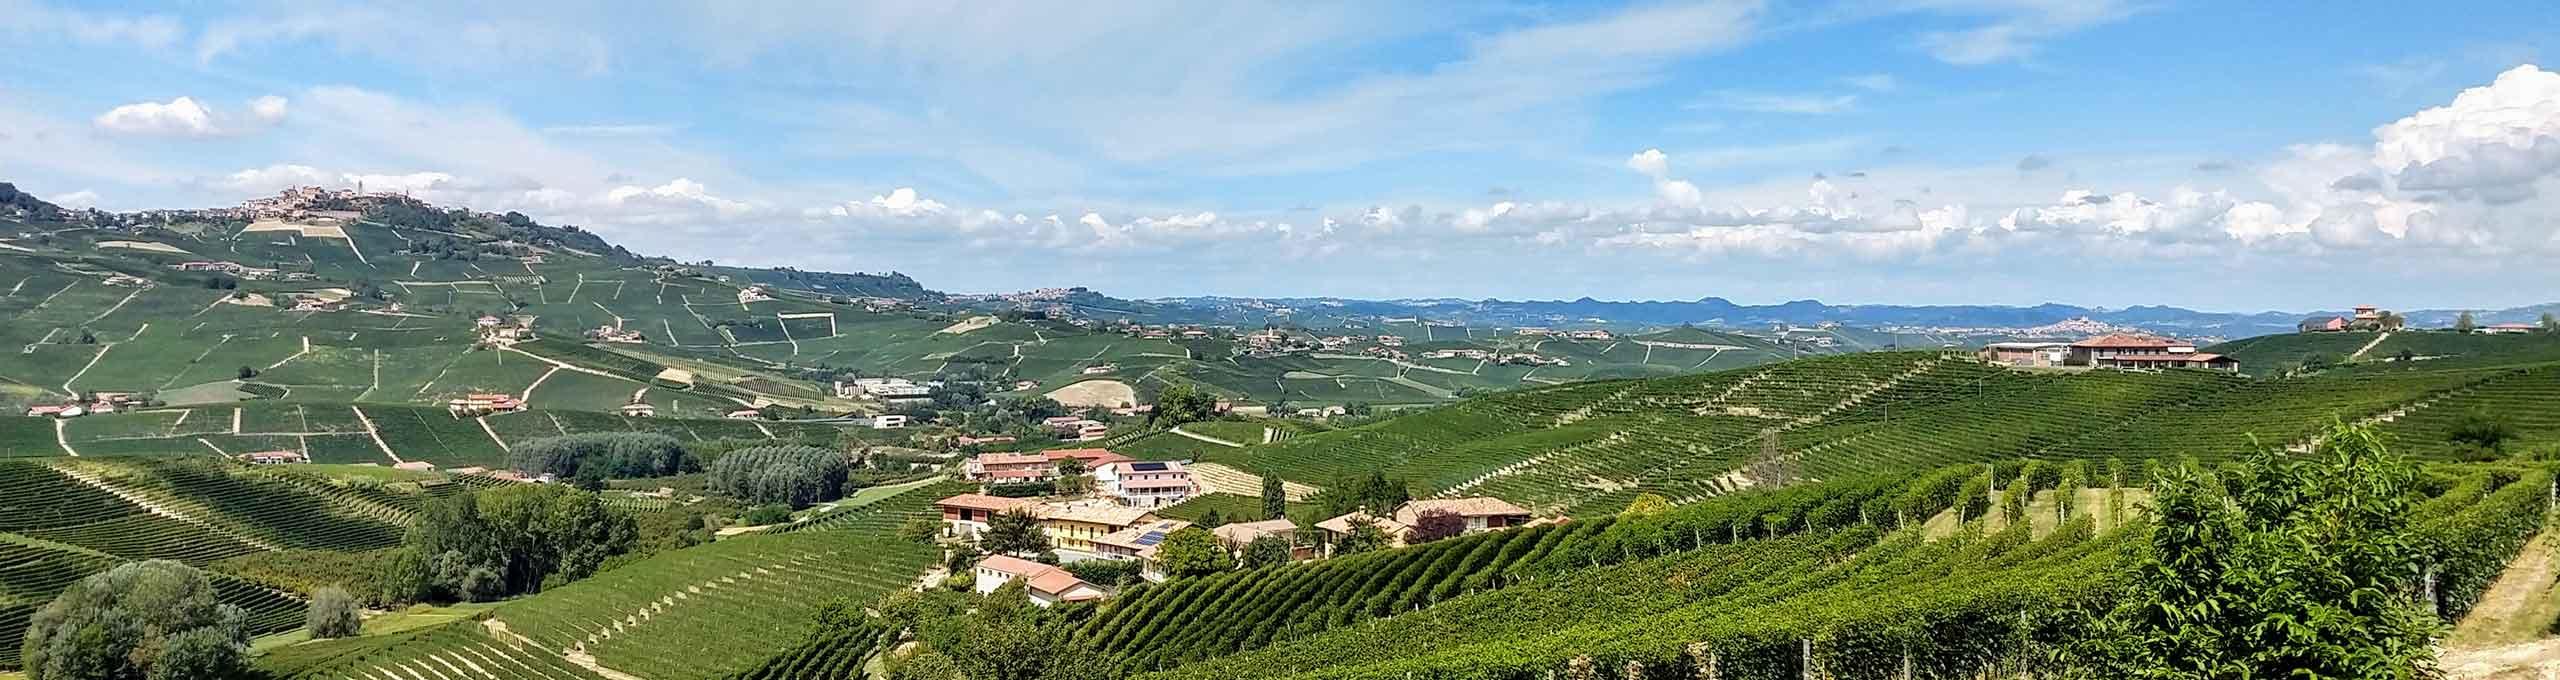 Serralunga D'Alba, zona bassa delle Langhe